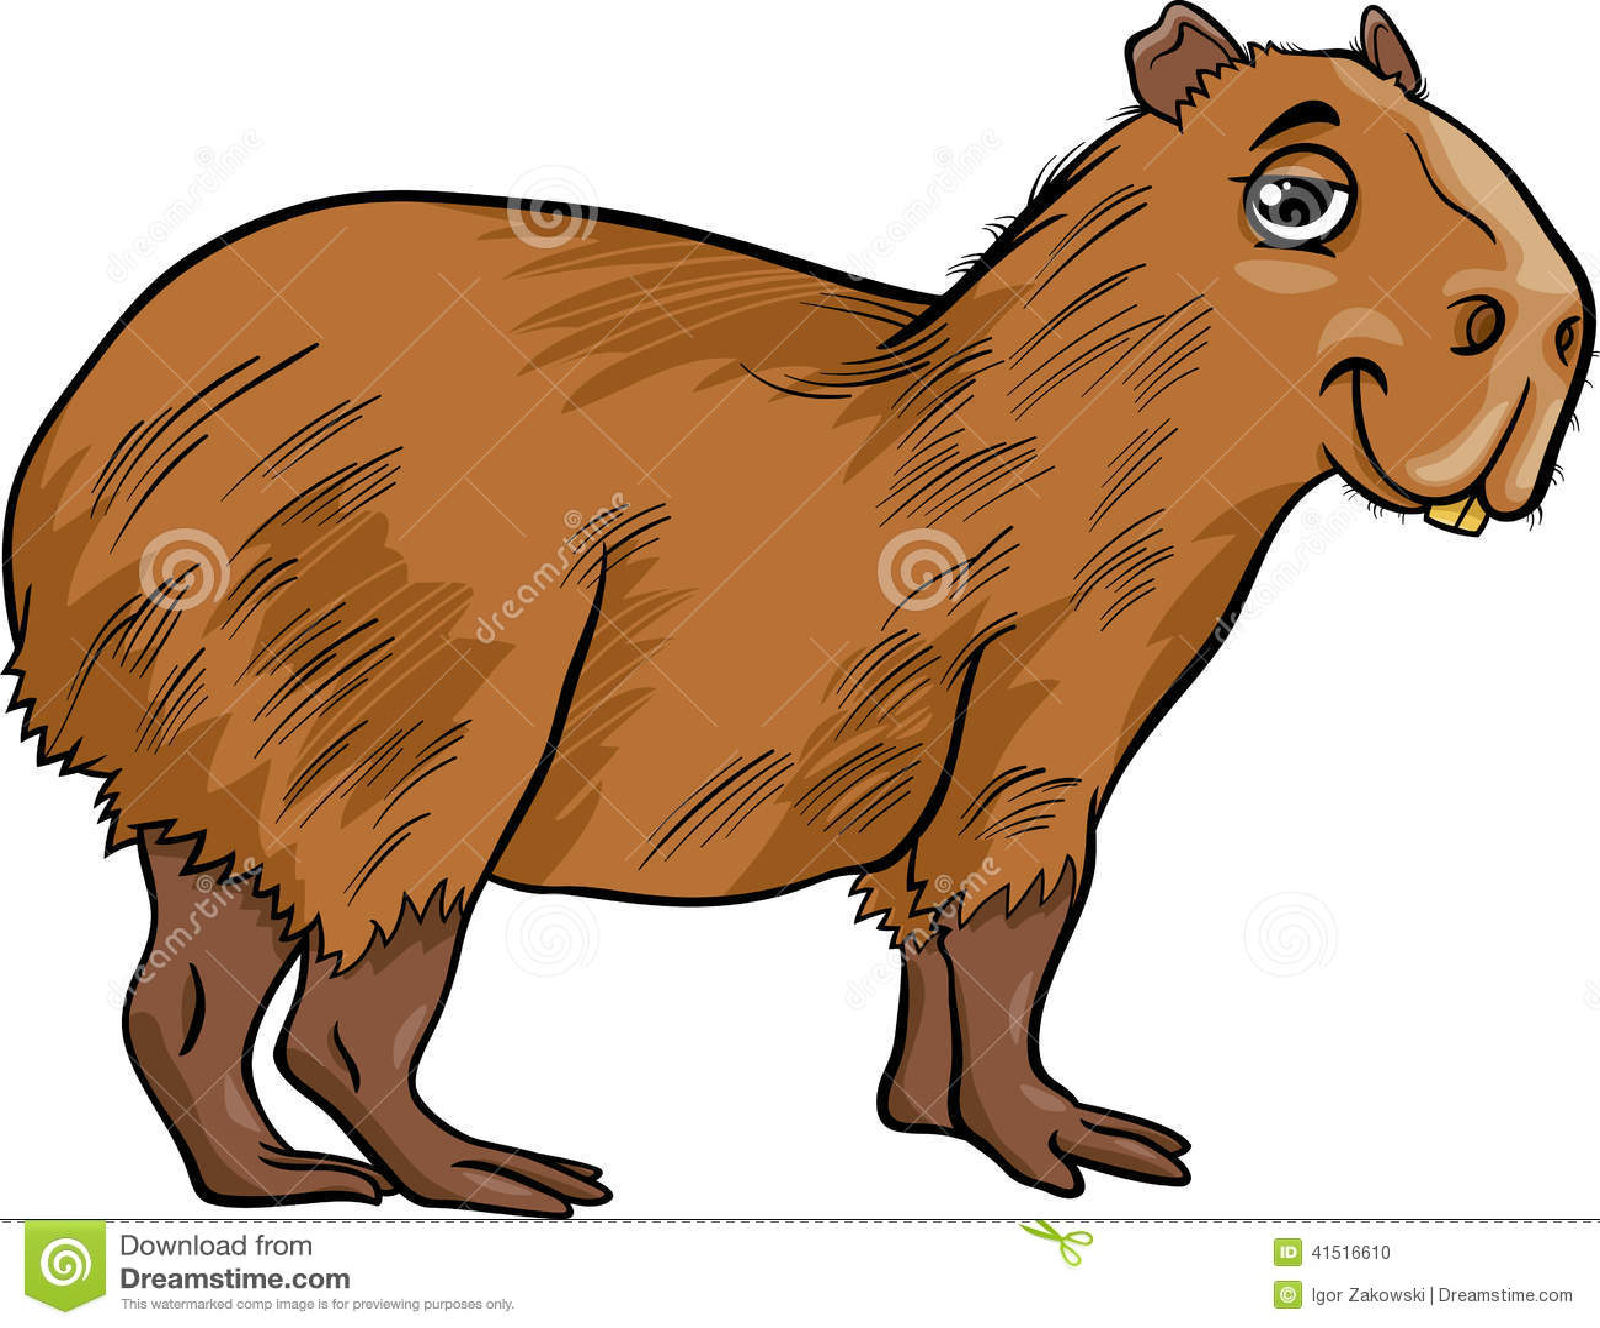 Capybara Animal Cartoon Illustration Stock Vector Image